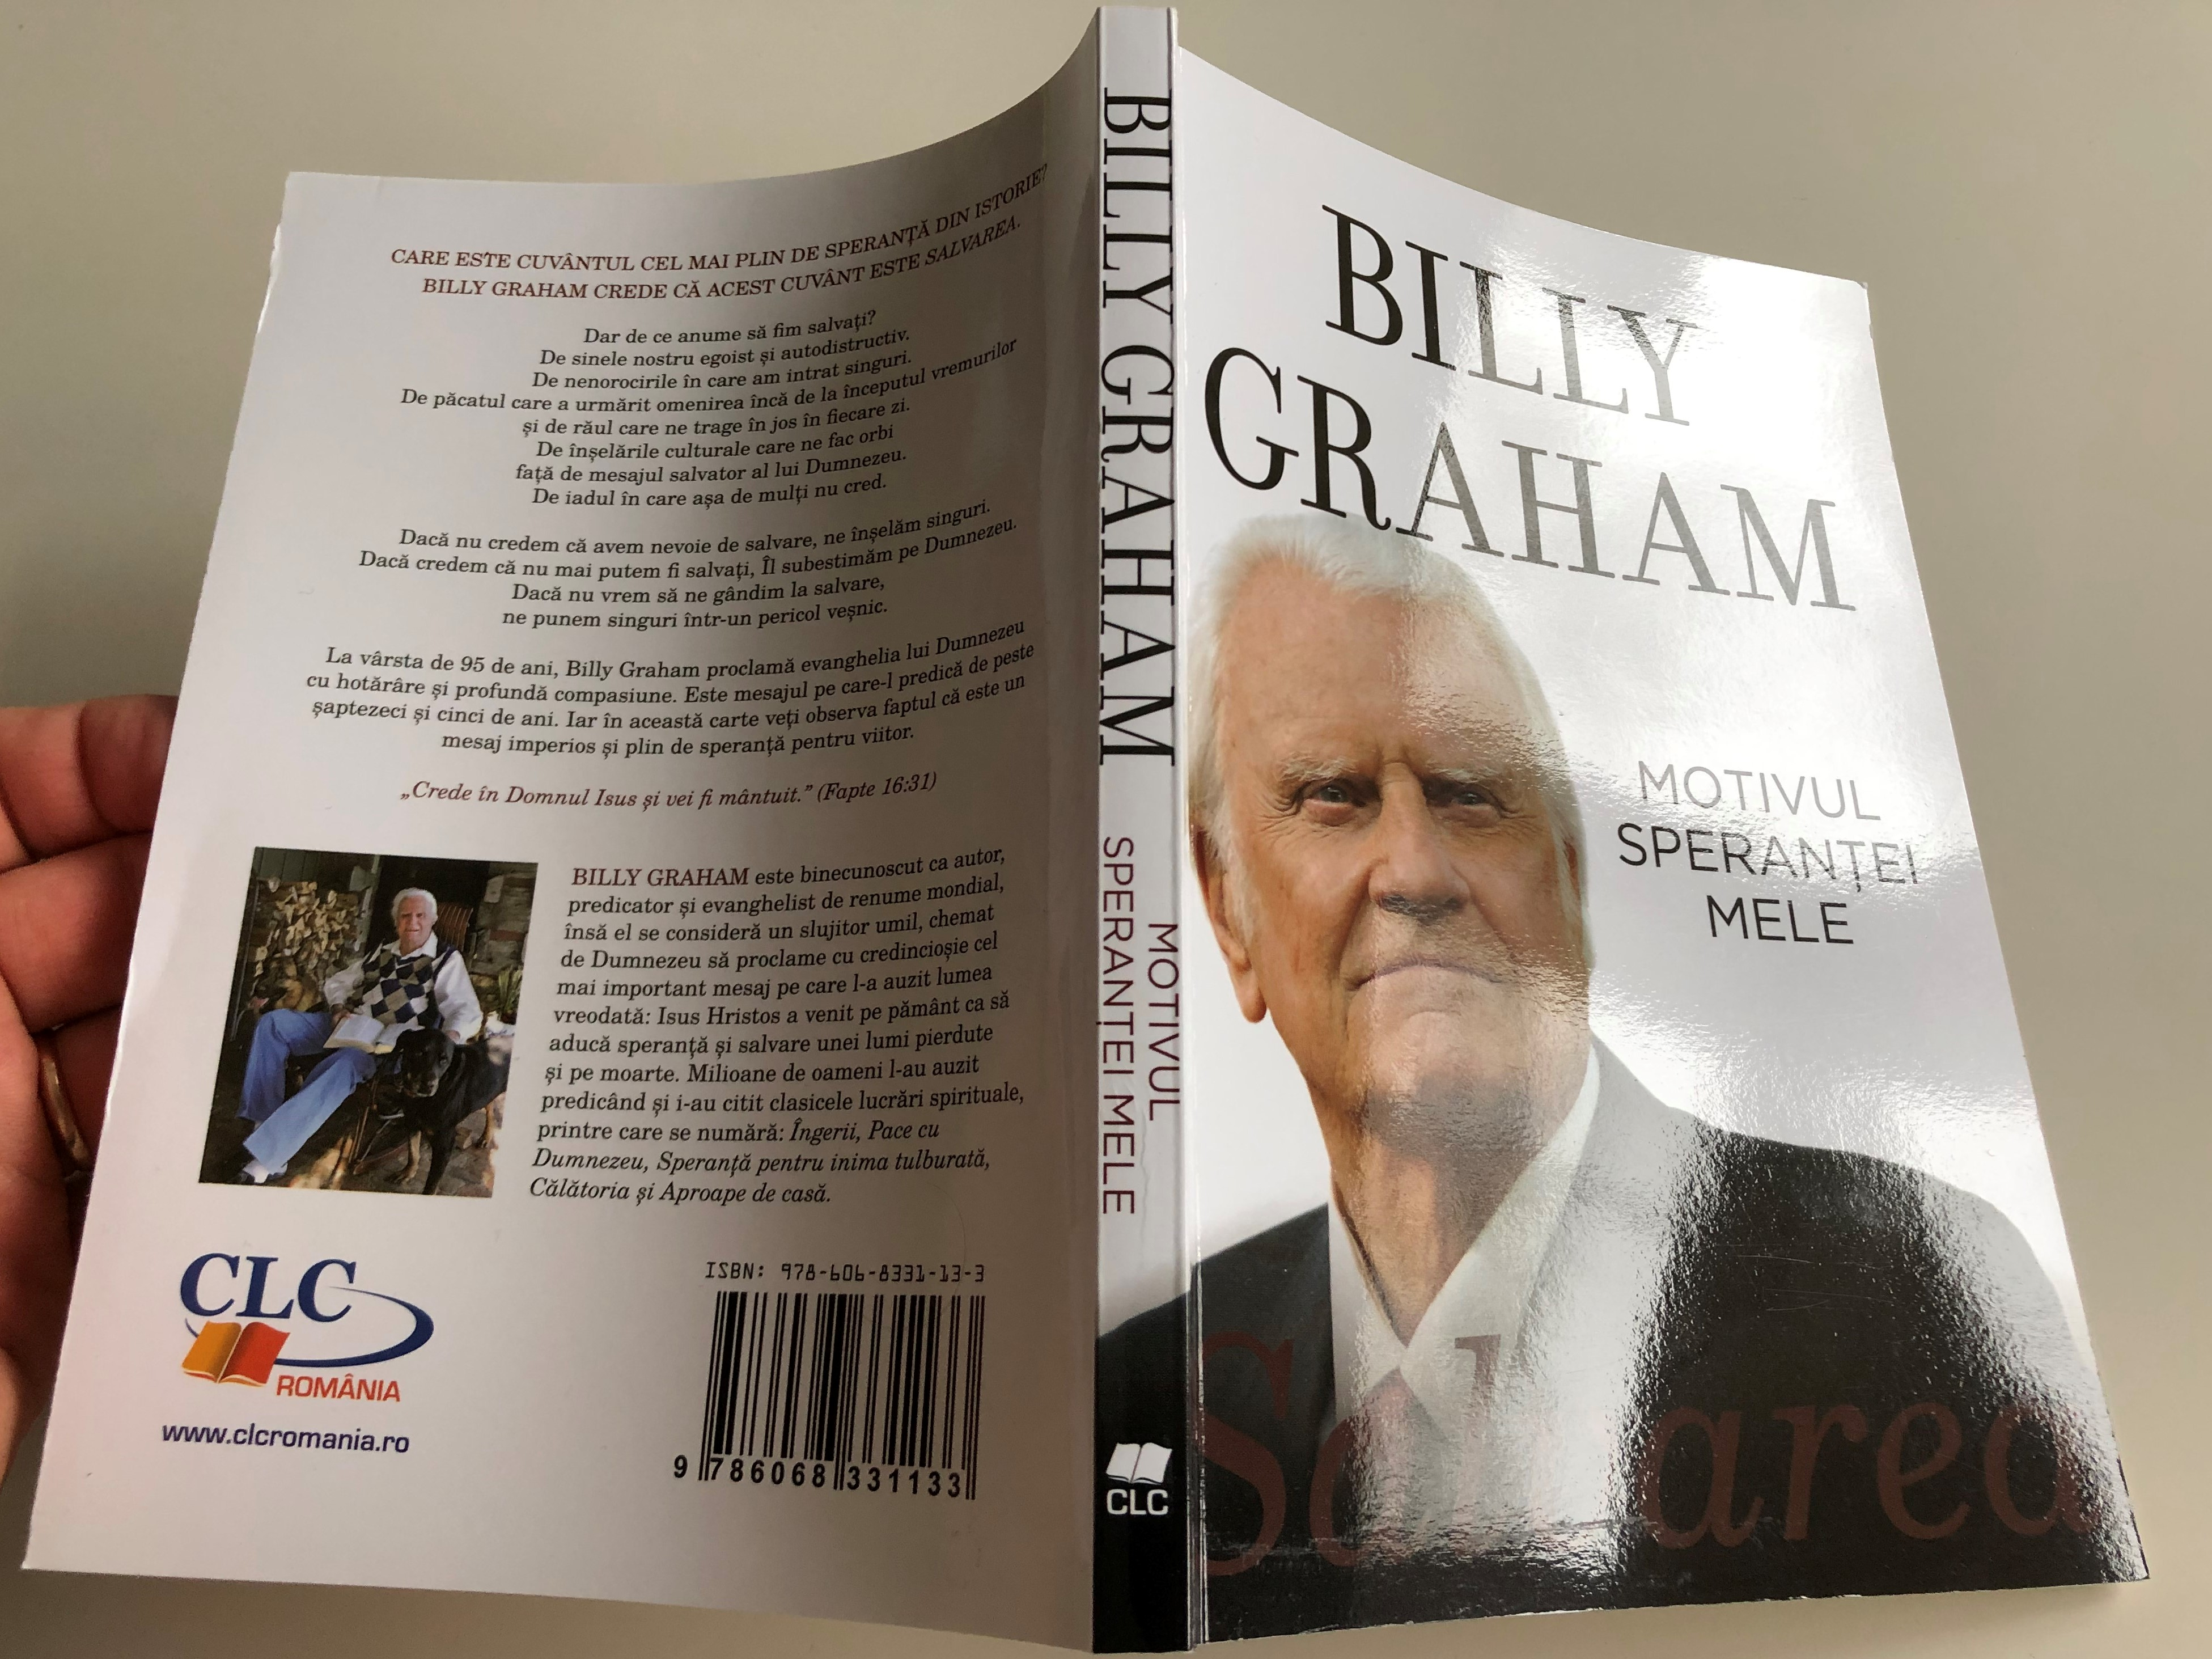 motivul-sperantei-mele-salvarea-by-billy-graham-romanian-translation-of-the-reason-for-my-hope-salvation-paperback-2014-clc-romania-13-.jpg